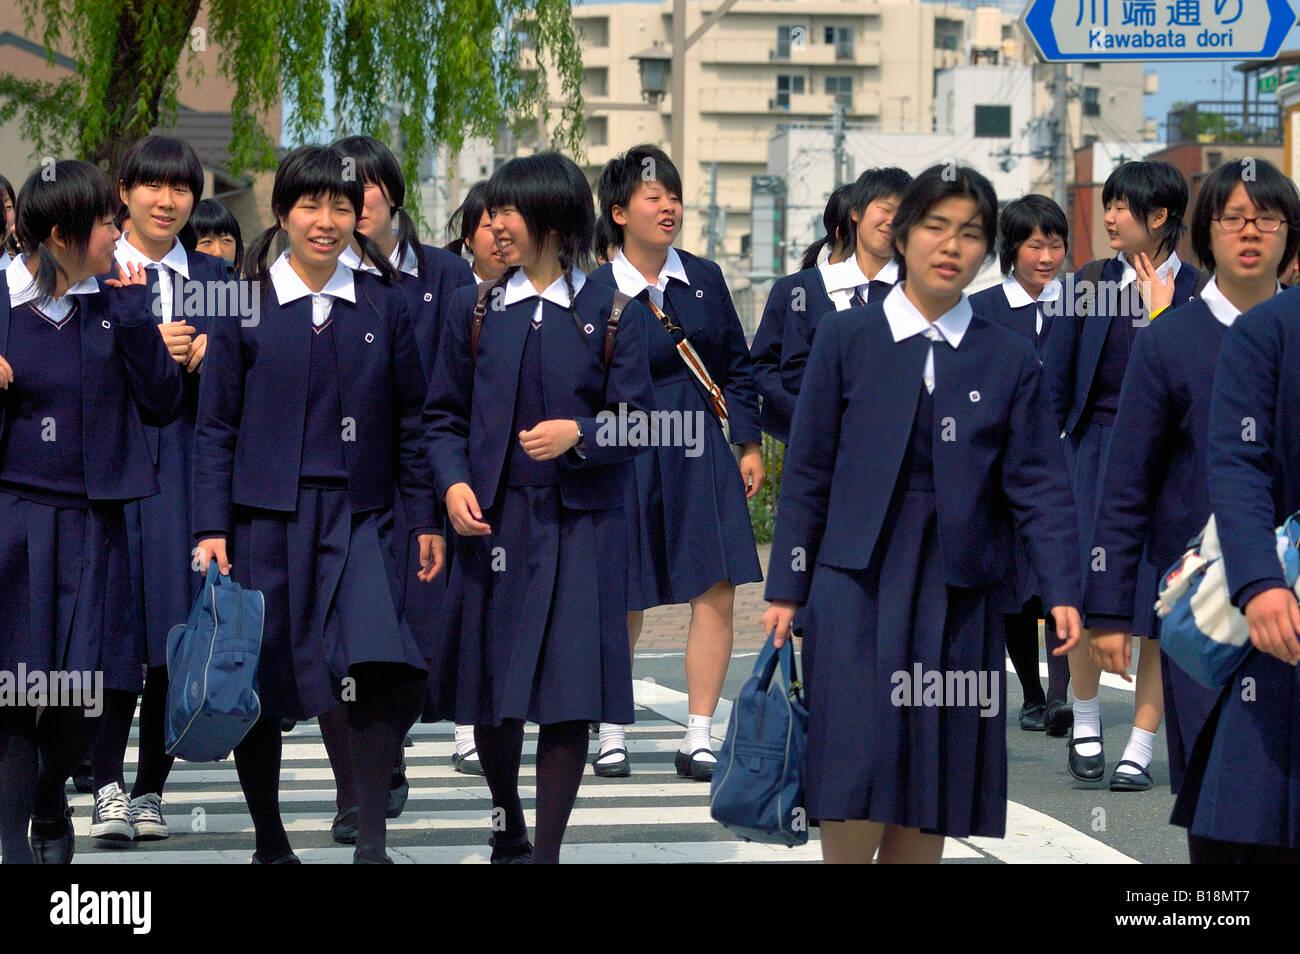 Girls At Crosswalk In School Uniform Kyoto Japan Stock Photo